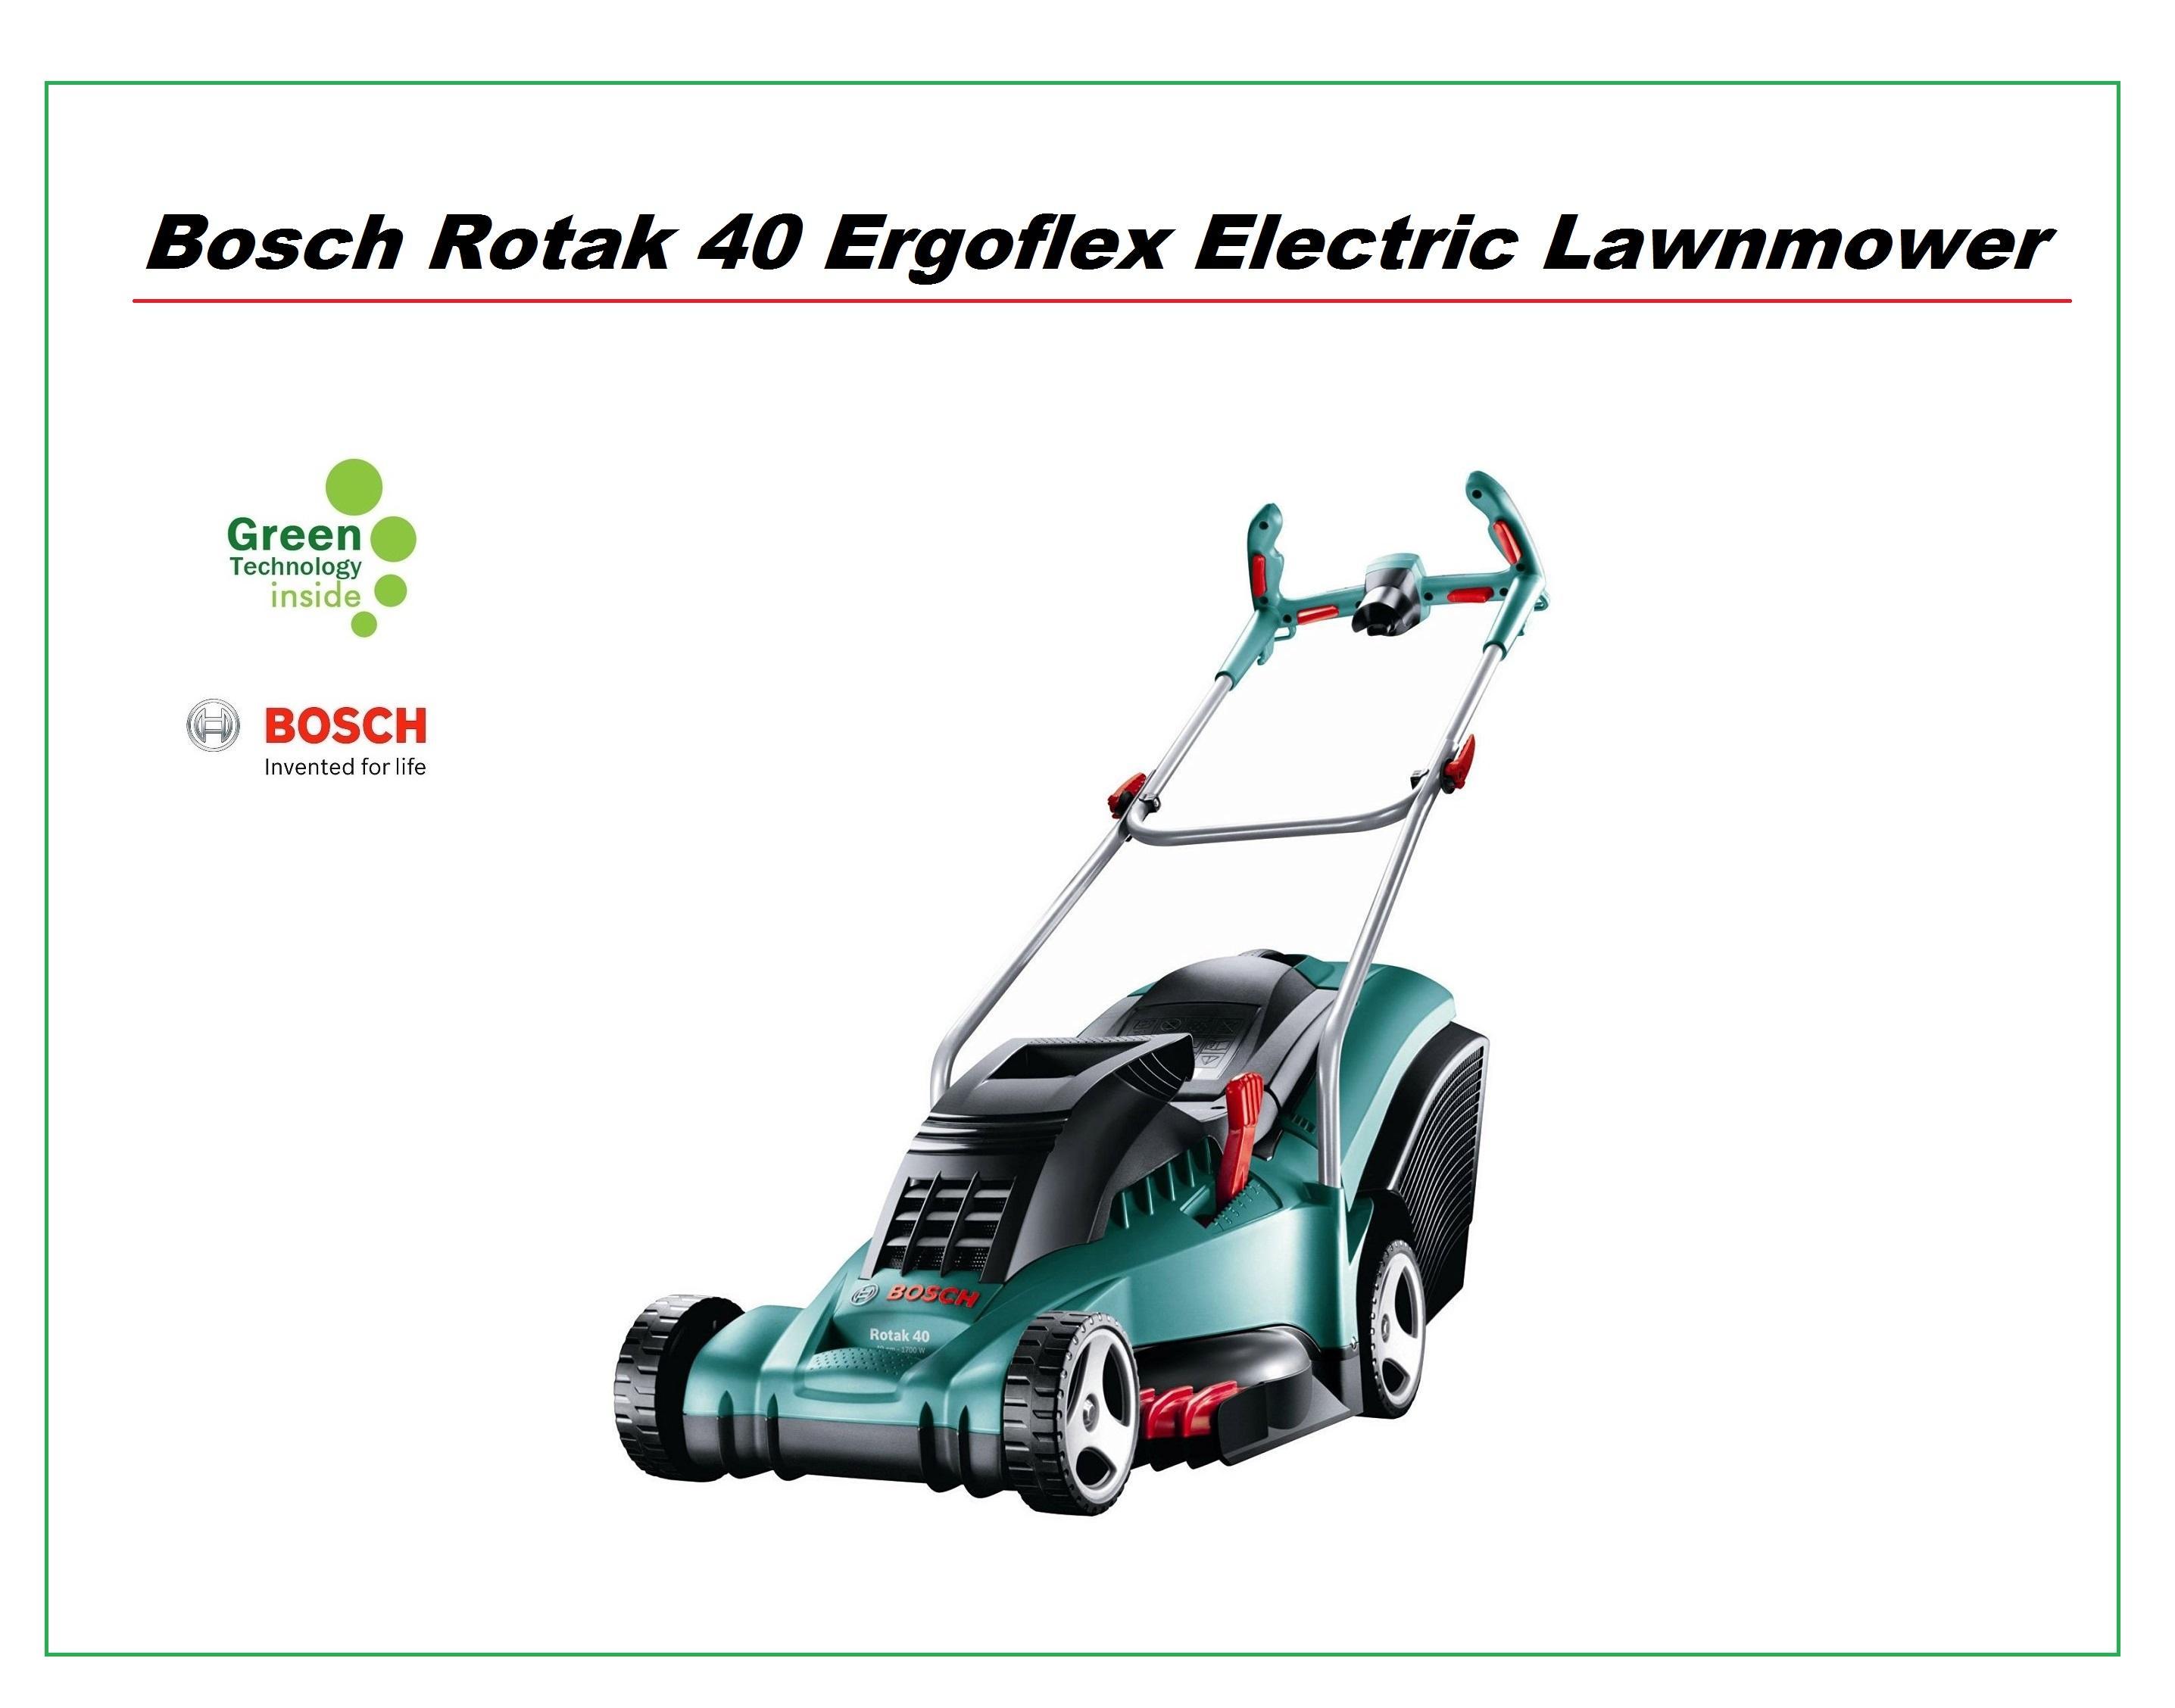 bosch rotak 40 17 ergoflex electric lawnmower 40cm metal blade and rear roller around the. Black Bedroom Furniture Sets. Home Design Ideas